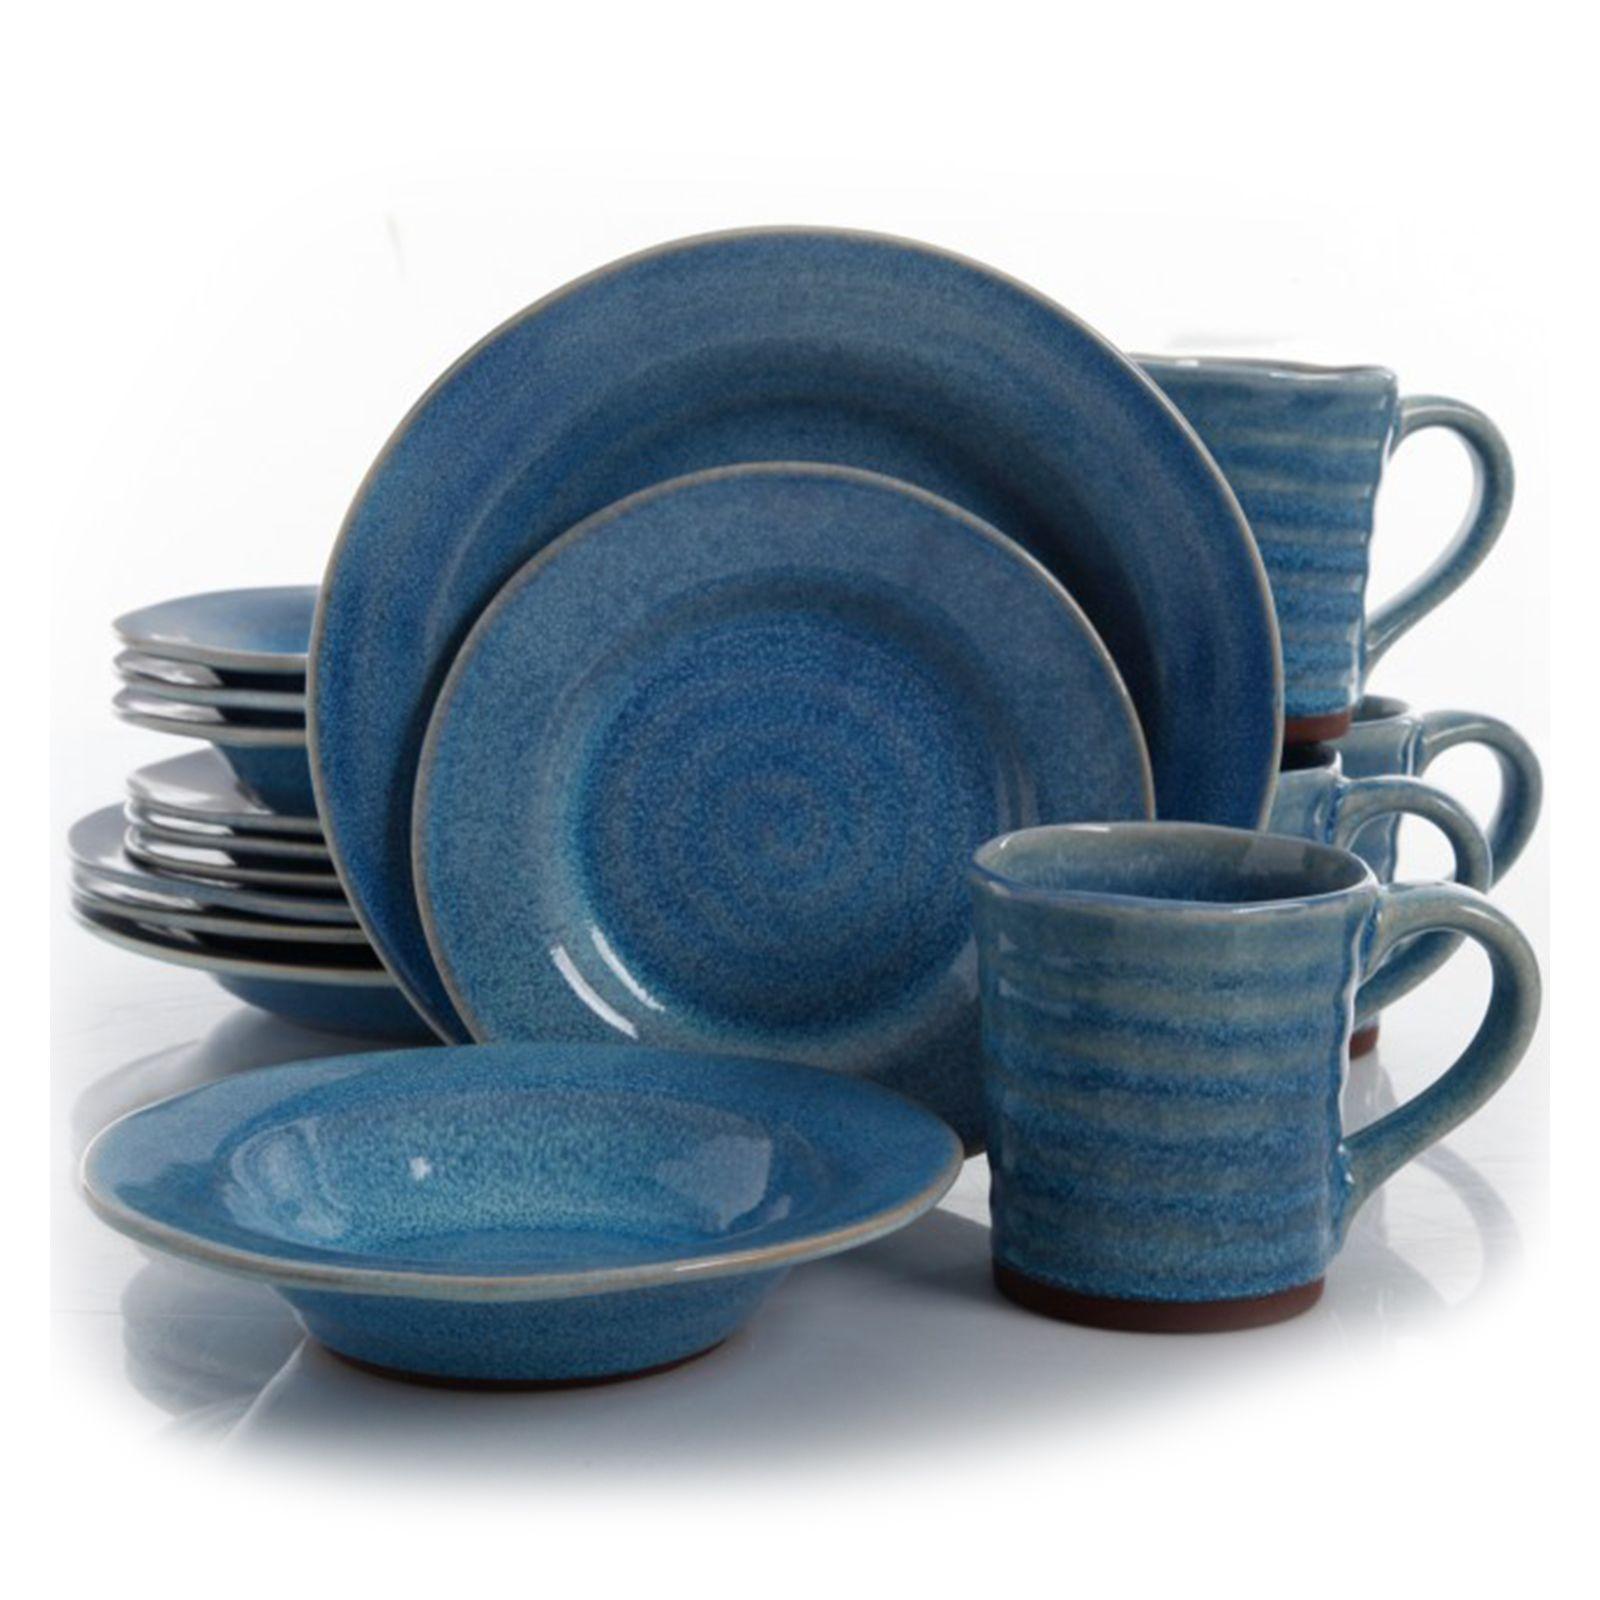 Gibson Mariani 16 Piece Stoneware Dinnerware Set in Blue  sc 1 st  Pinterest & Gibson Mariani 16 Piece Stoneware Dinnerware Set in Blue | Products ...